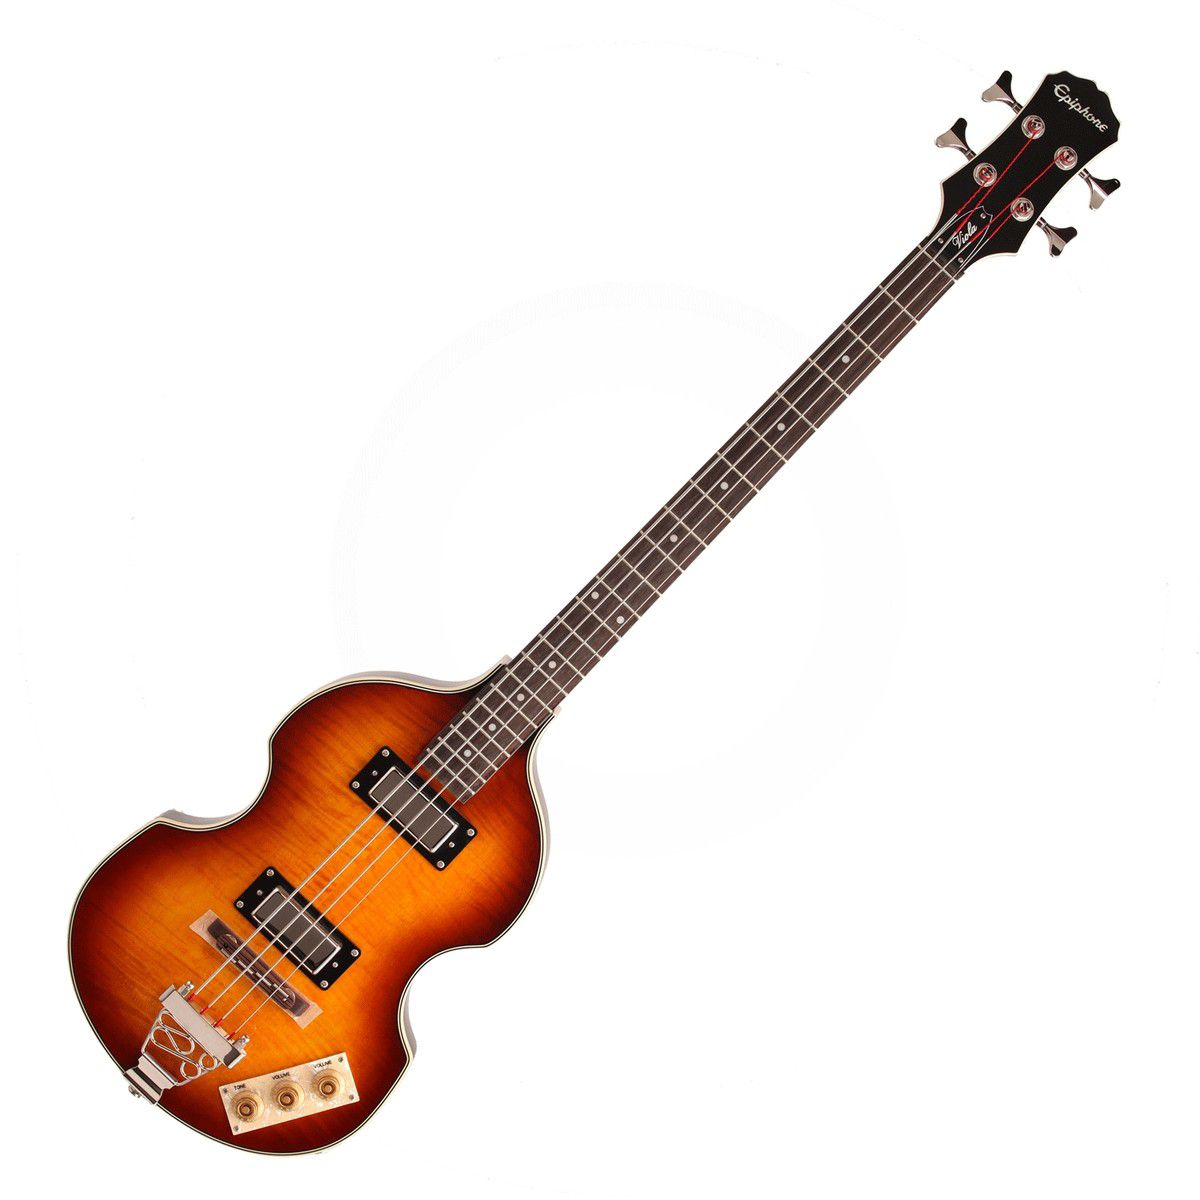 Contrabaixo Epiphone Viola Bass Vintage Sunburst